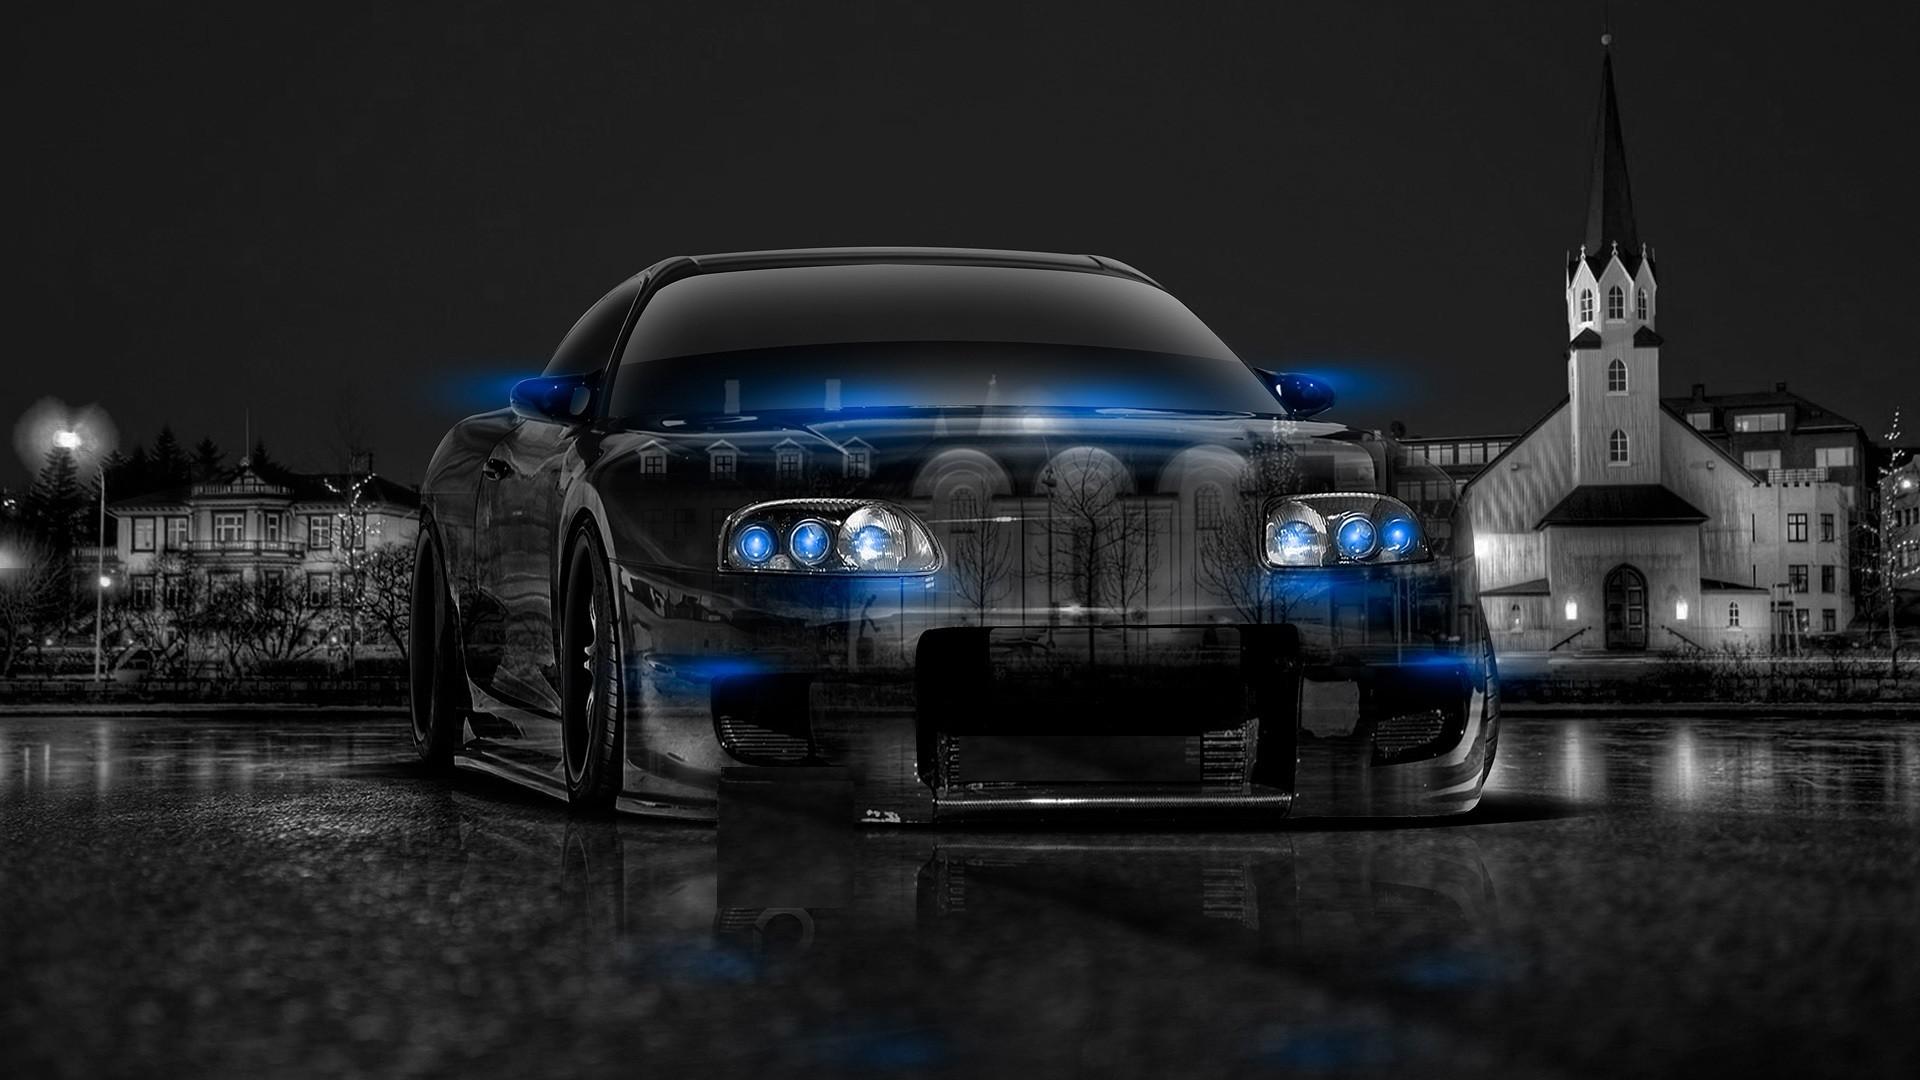 Abstract Black Blue Toyota Supra HD Wallpaper